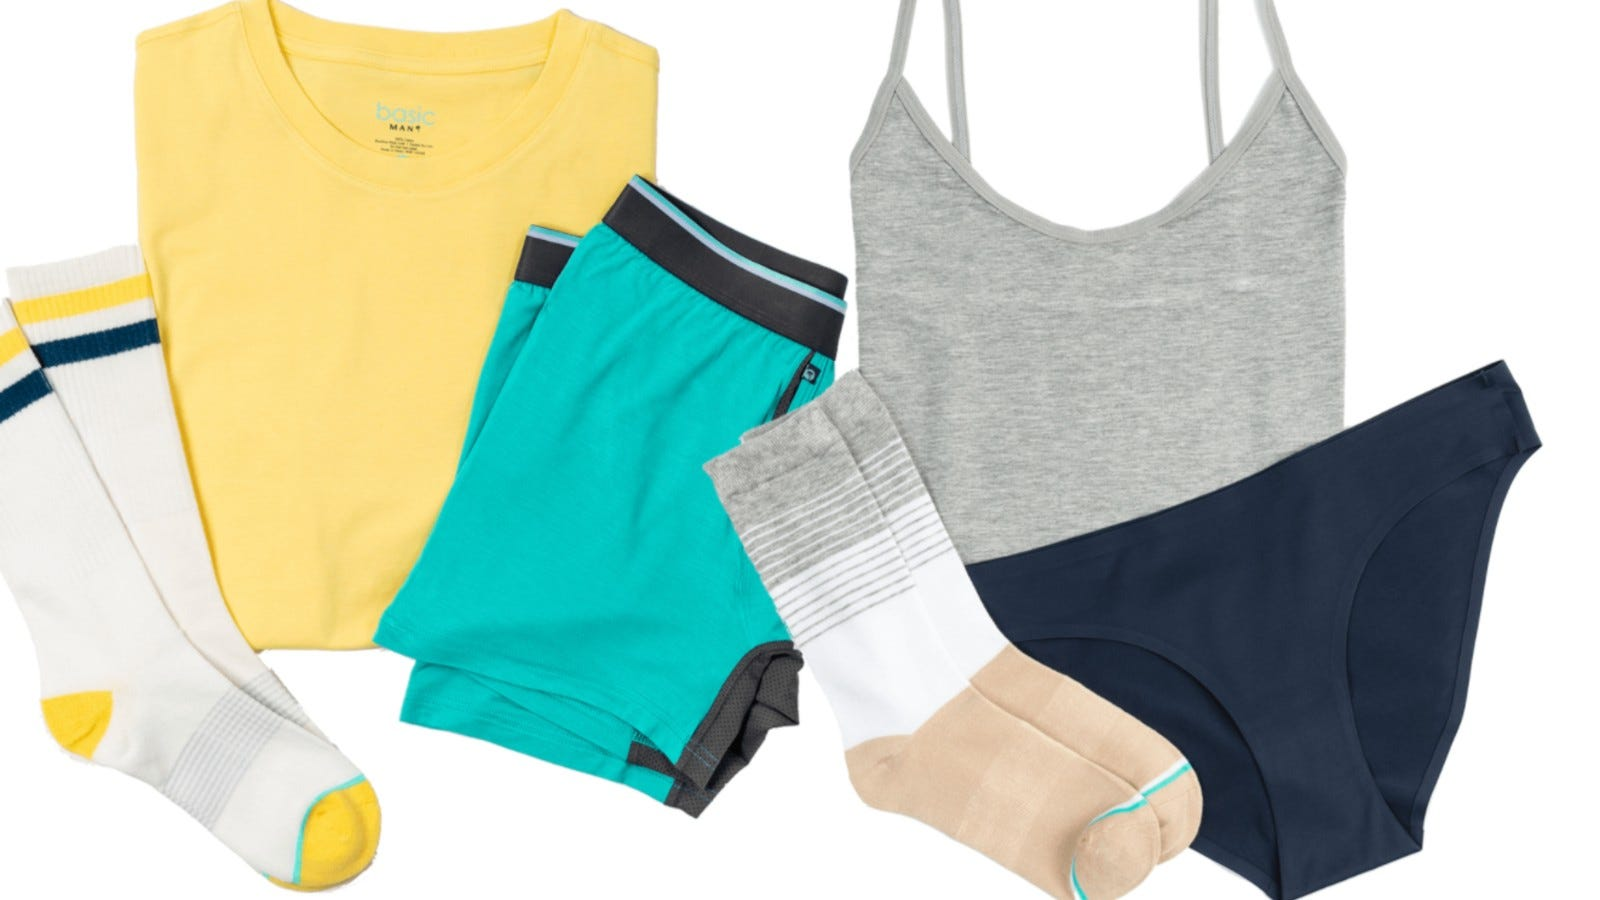 T-shirts, underwear, and socks.